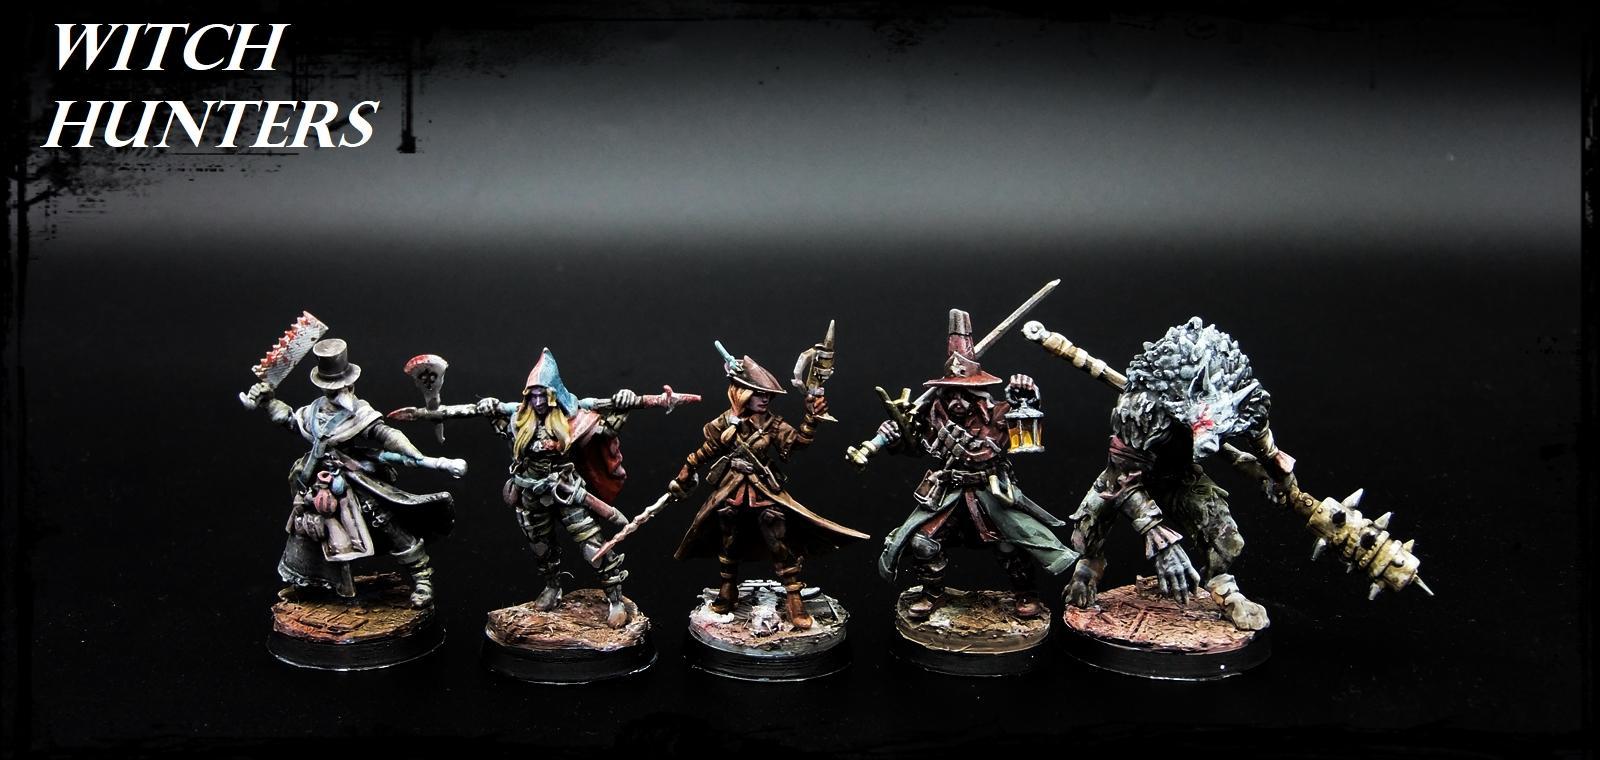 3d Print, Age Of Sigmar, Empire, Mordheim, Titan Forge, Warhammer Fantasy